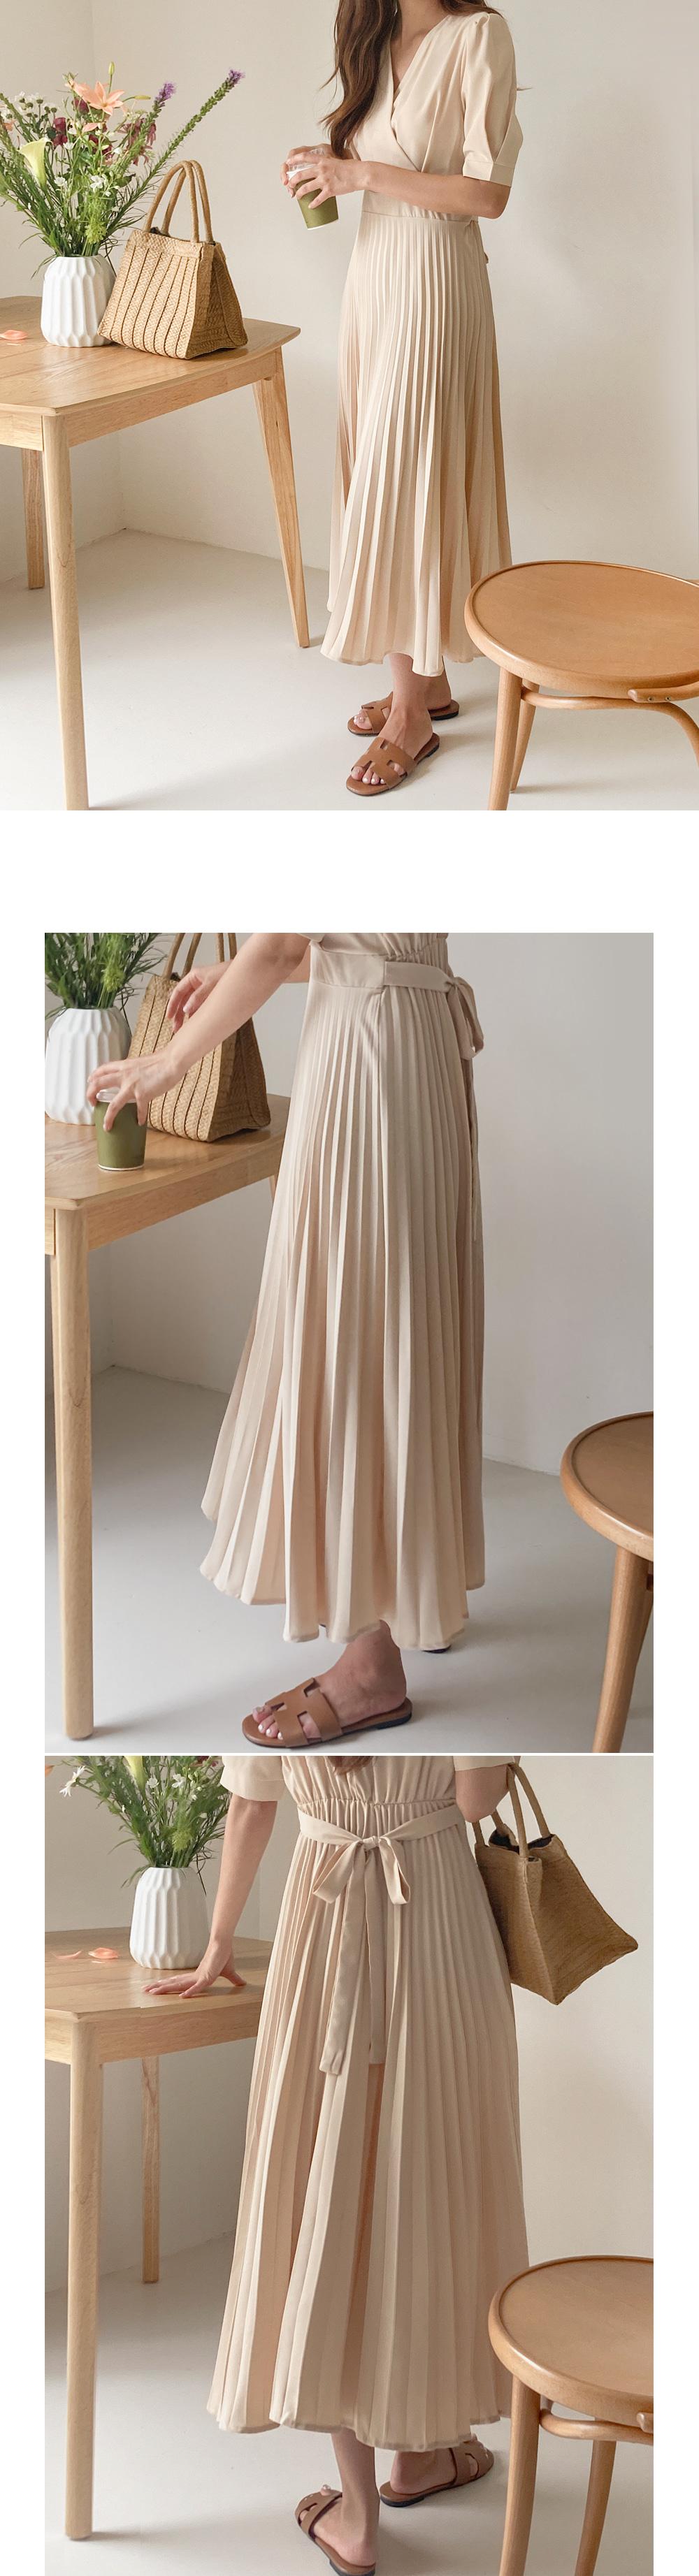 Kurz Dress